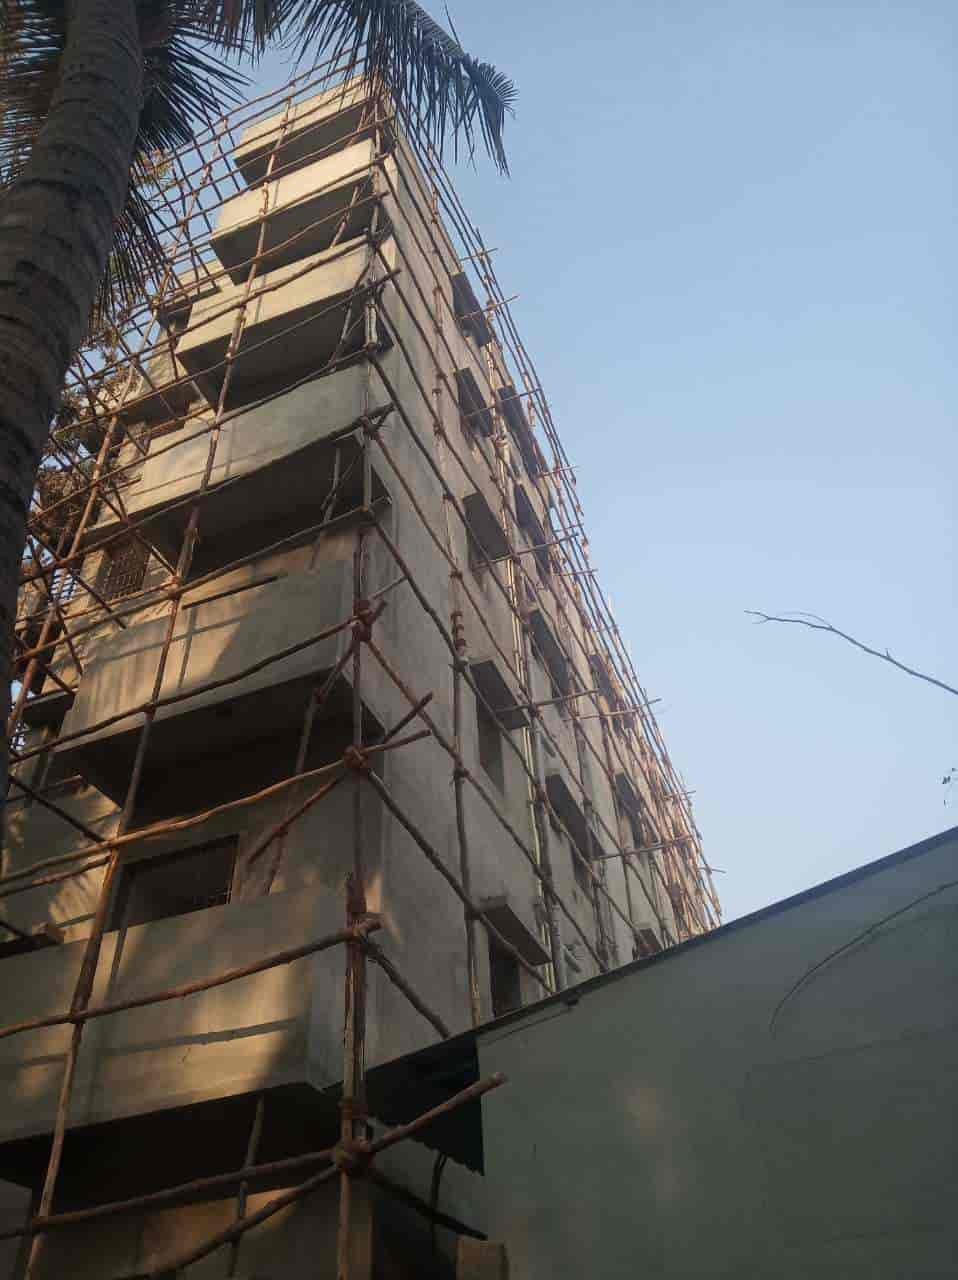 HKGN Poles, Venkatapura Koramangala - Scaffolding On Hire in